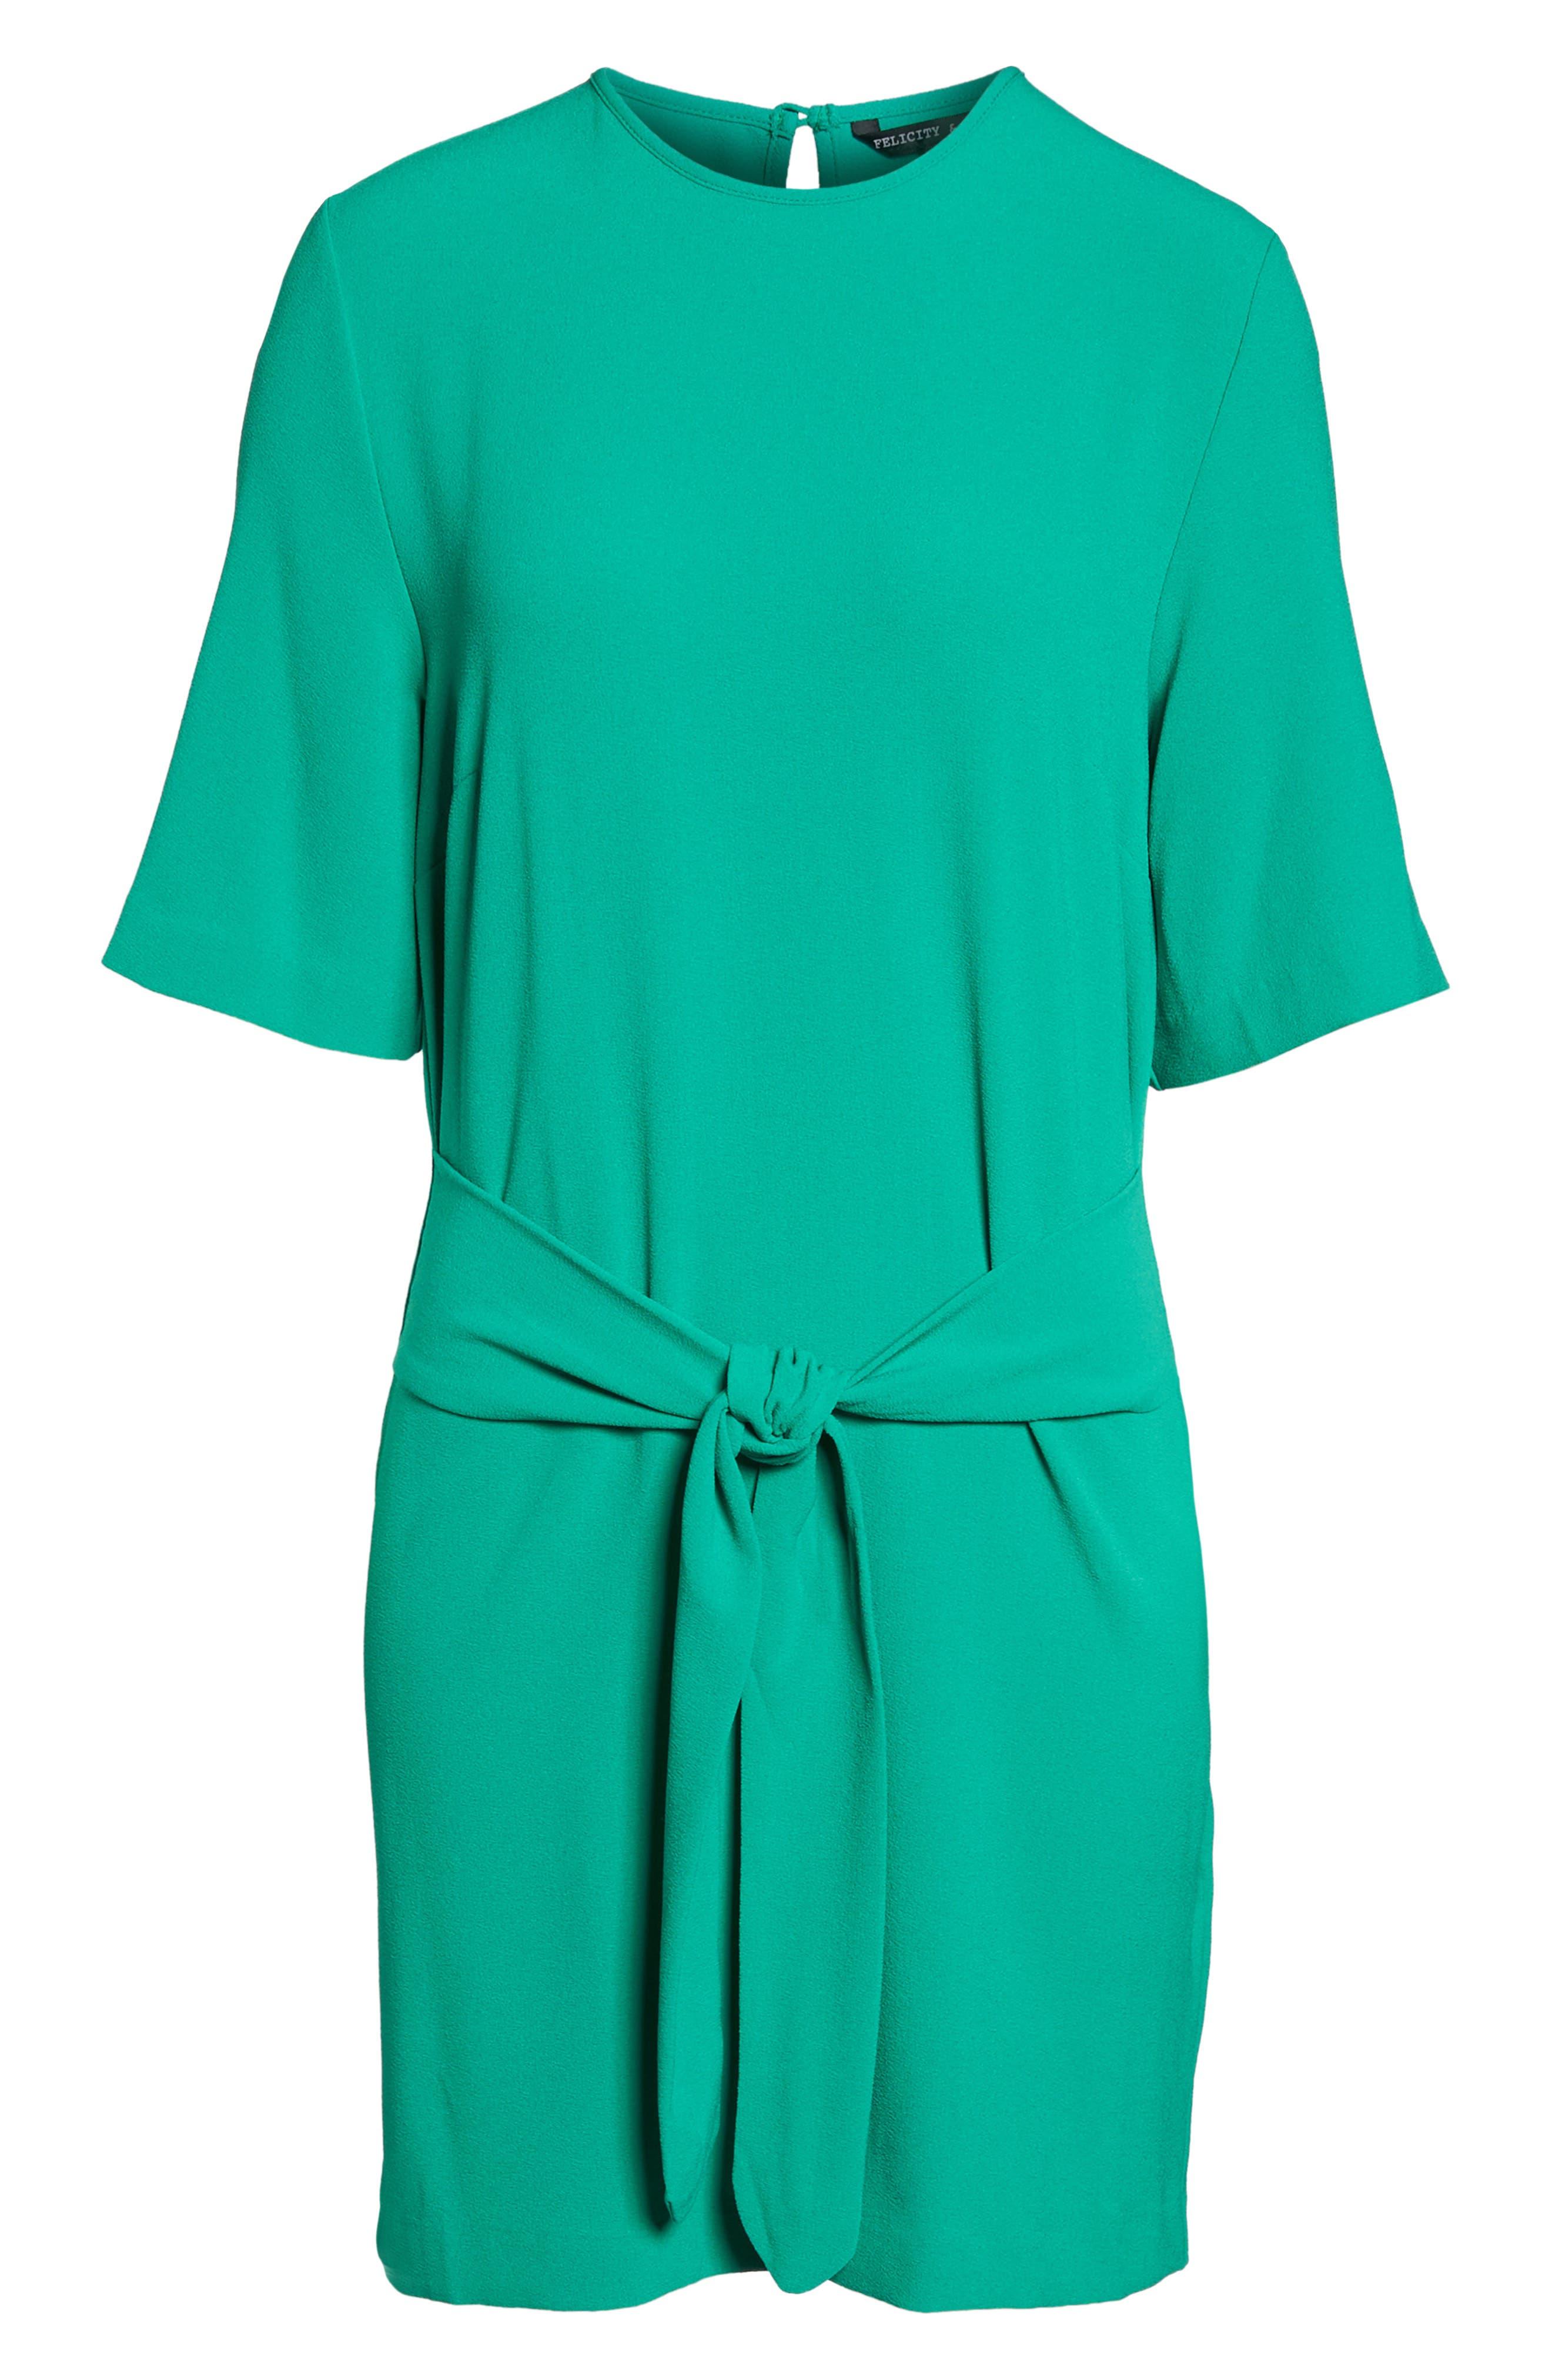 Dara Shift Dress,                             Alternate thumbnail 7, color,                             319